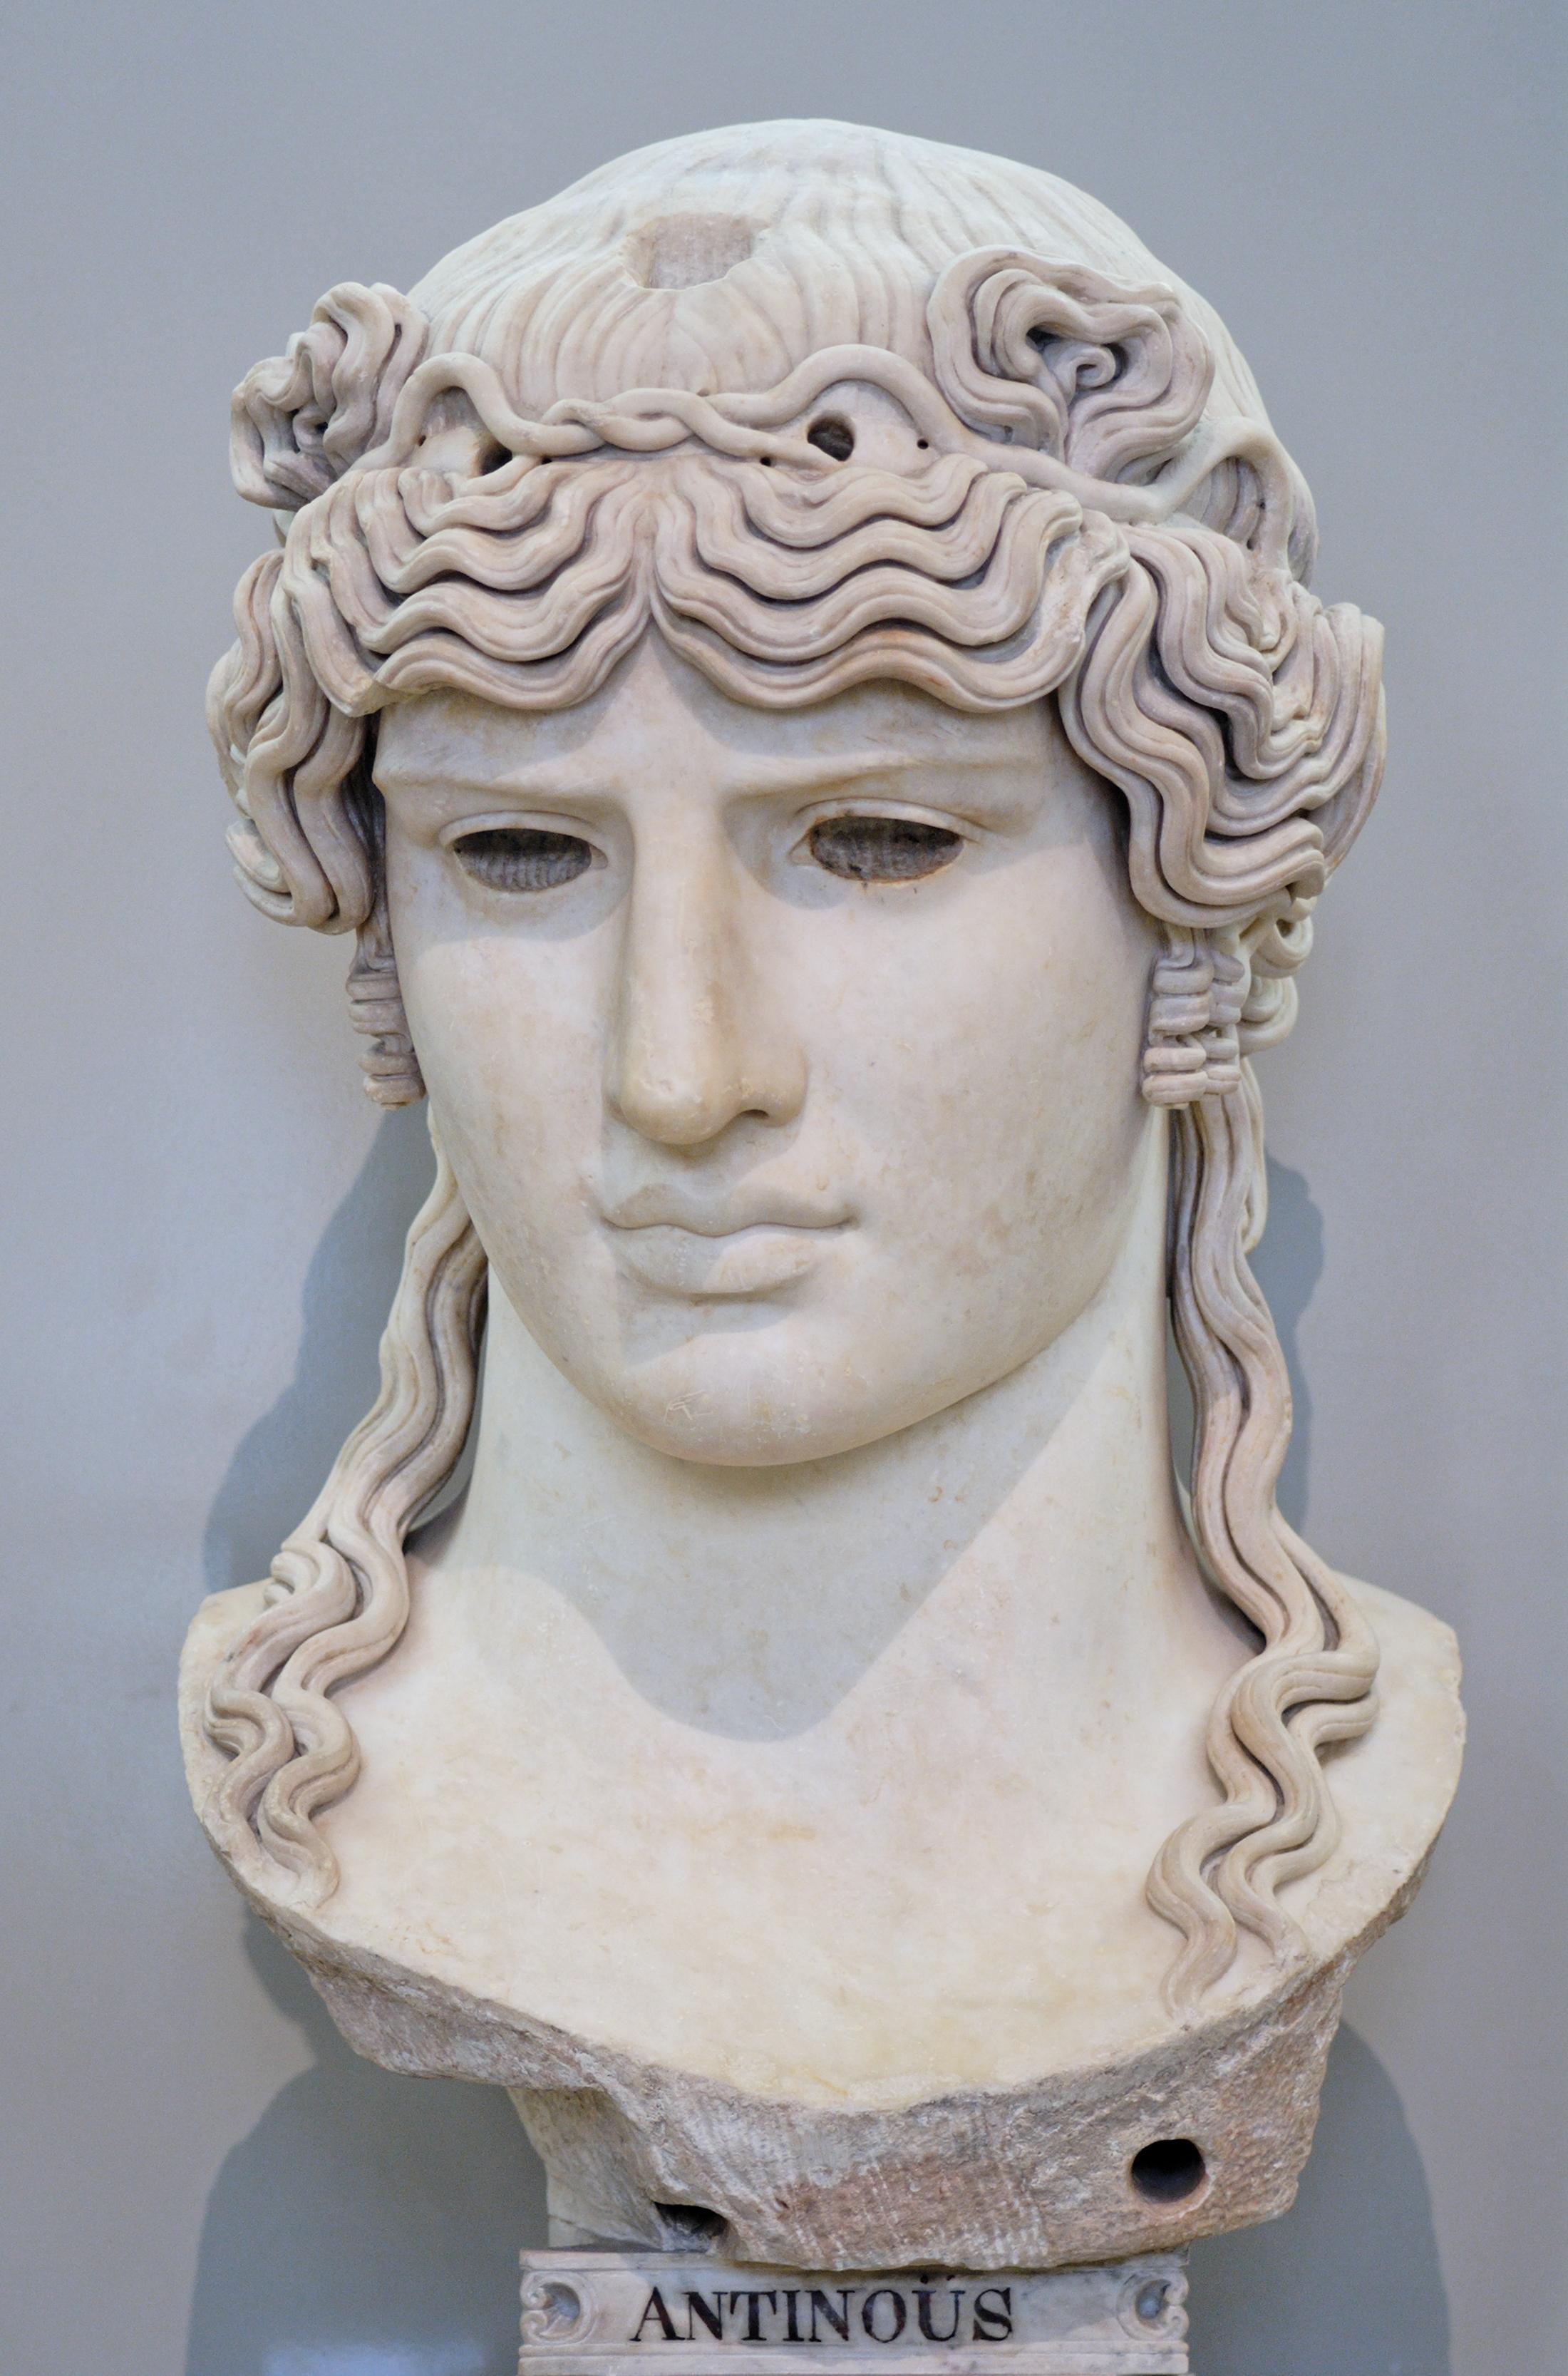 File:Antinous Mondragone Louvre Ma1205.jpg - Wikimedia Commons